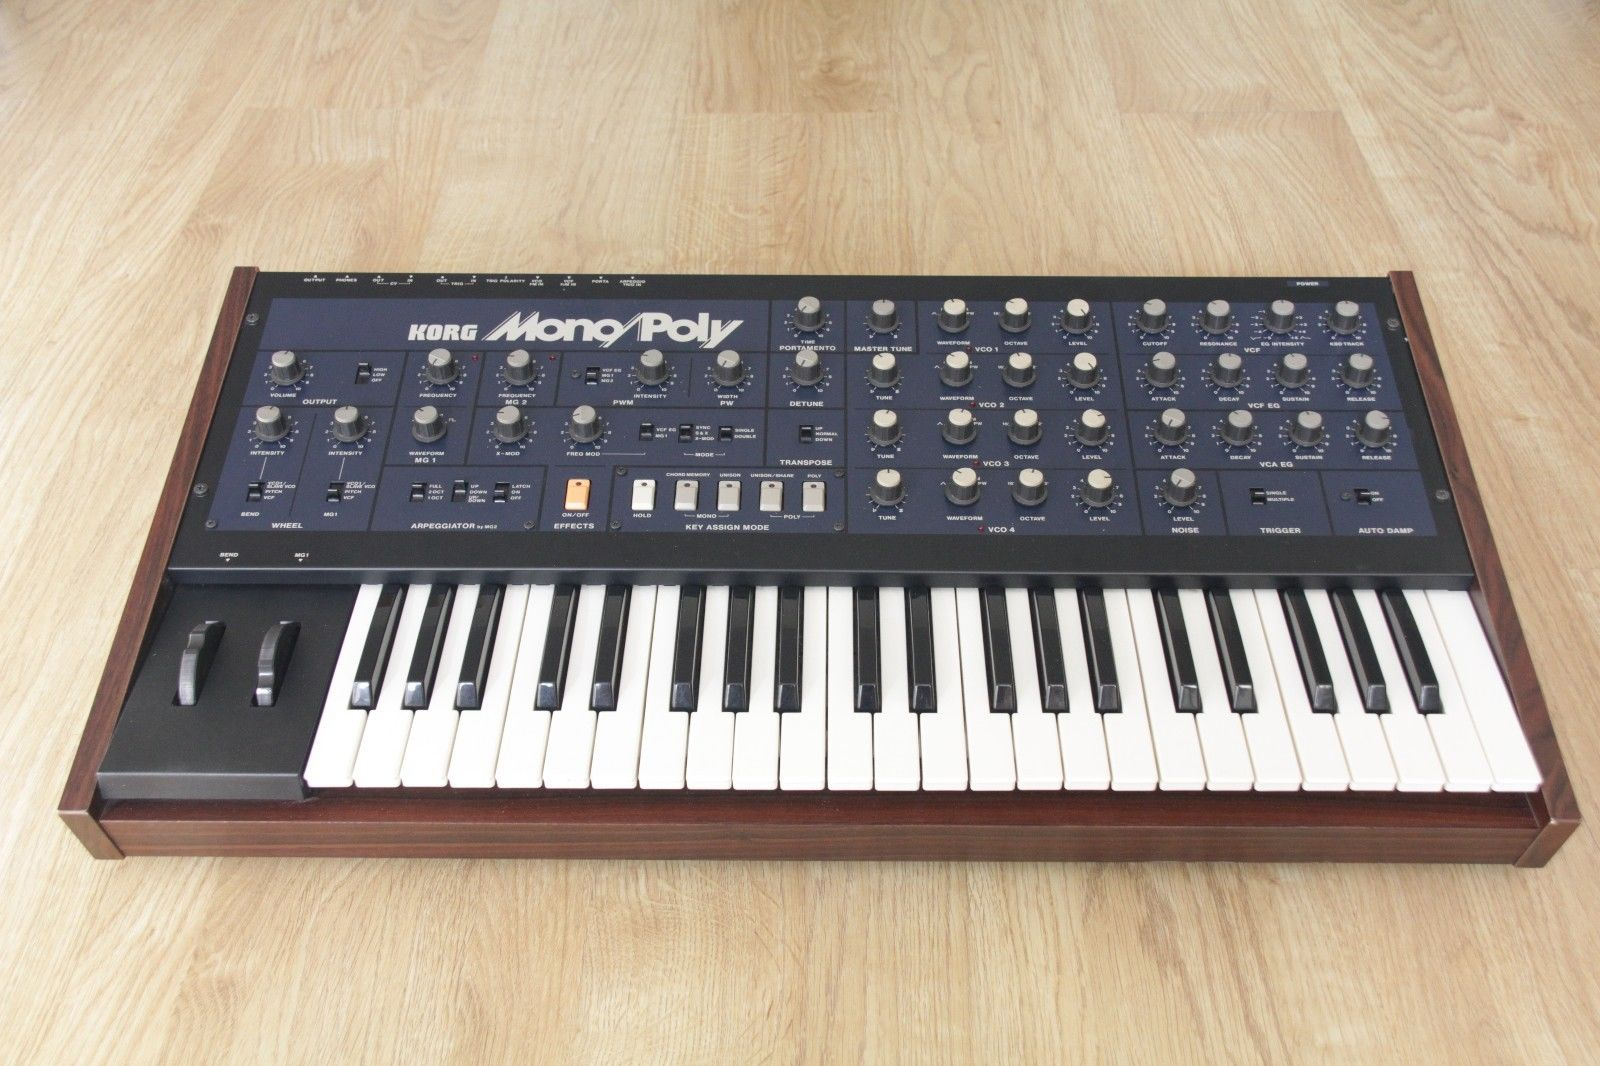 MATRIXSYNTH: Korg Mono/Poly Keyboard Synthesizer SN 378232